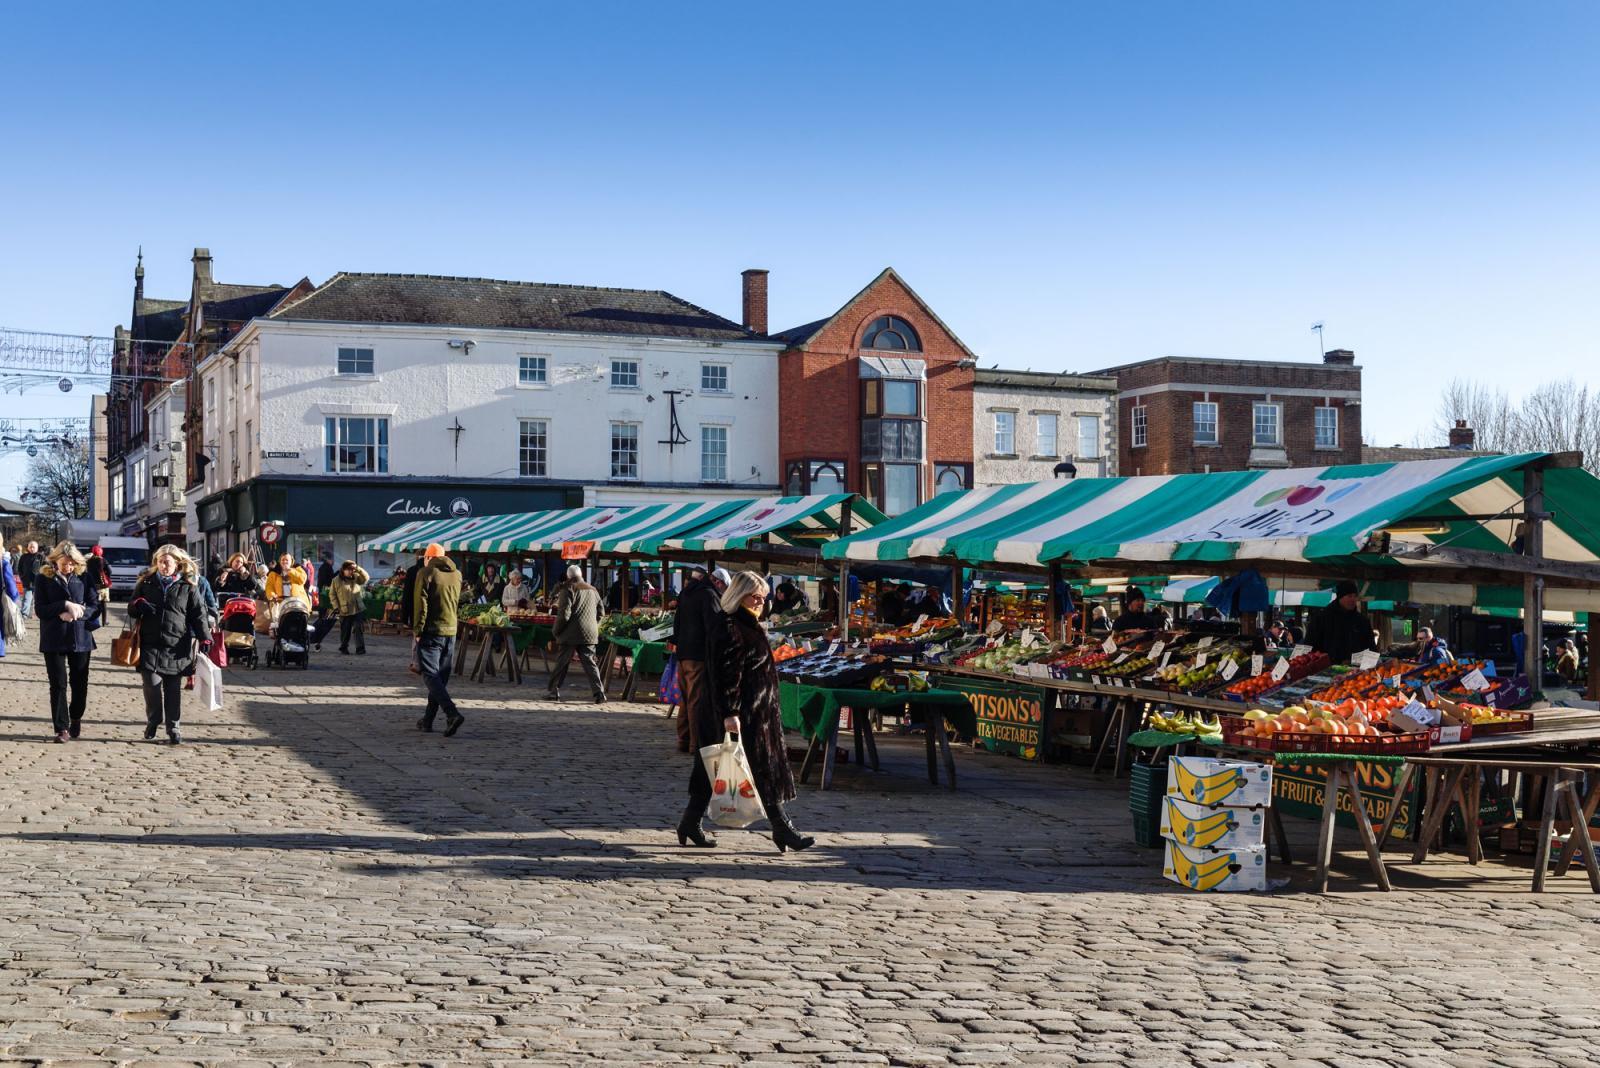 town-market-c-Ian-Francis-shutterstock